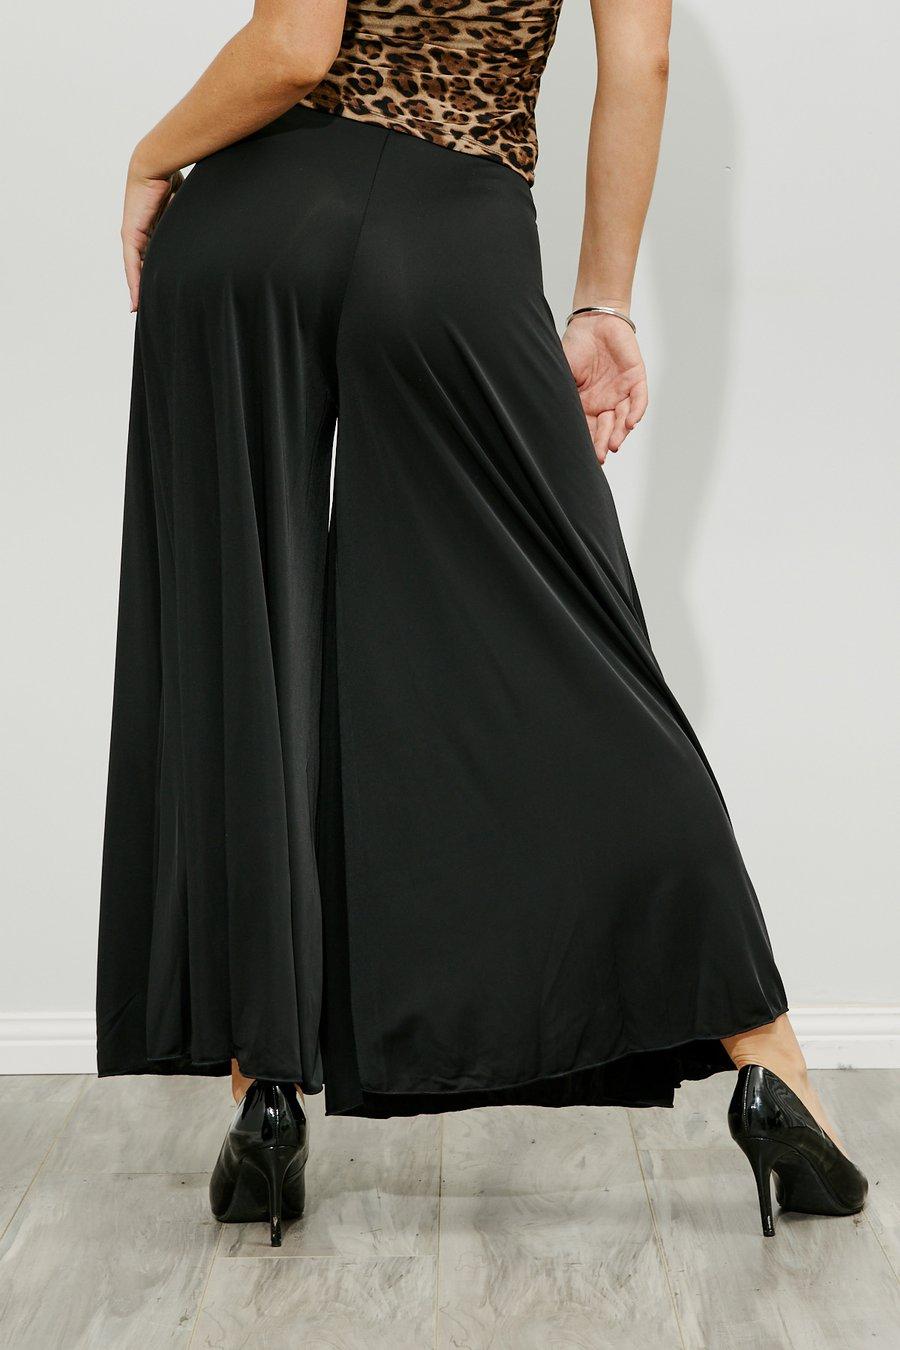 Image of Calott Pants - Black or Chocolate B3180 Dancewear latin ballroom